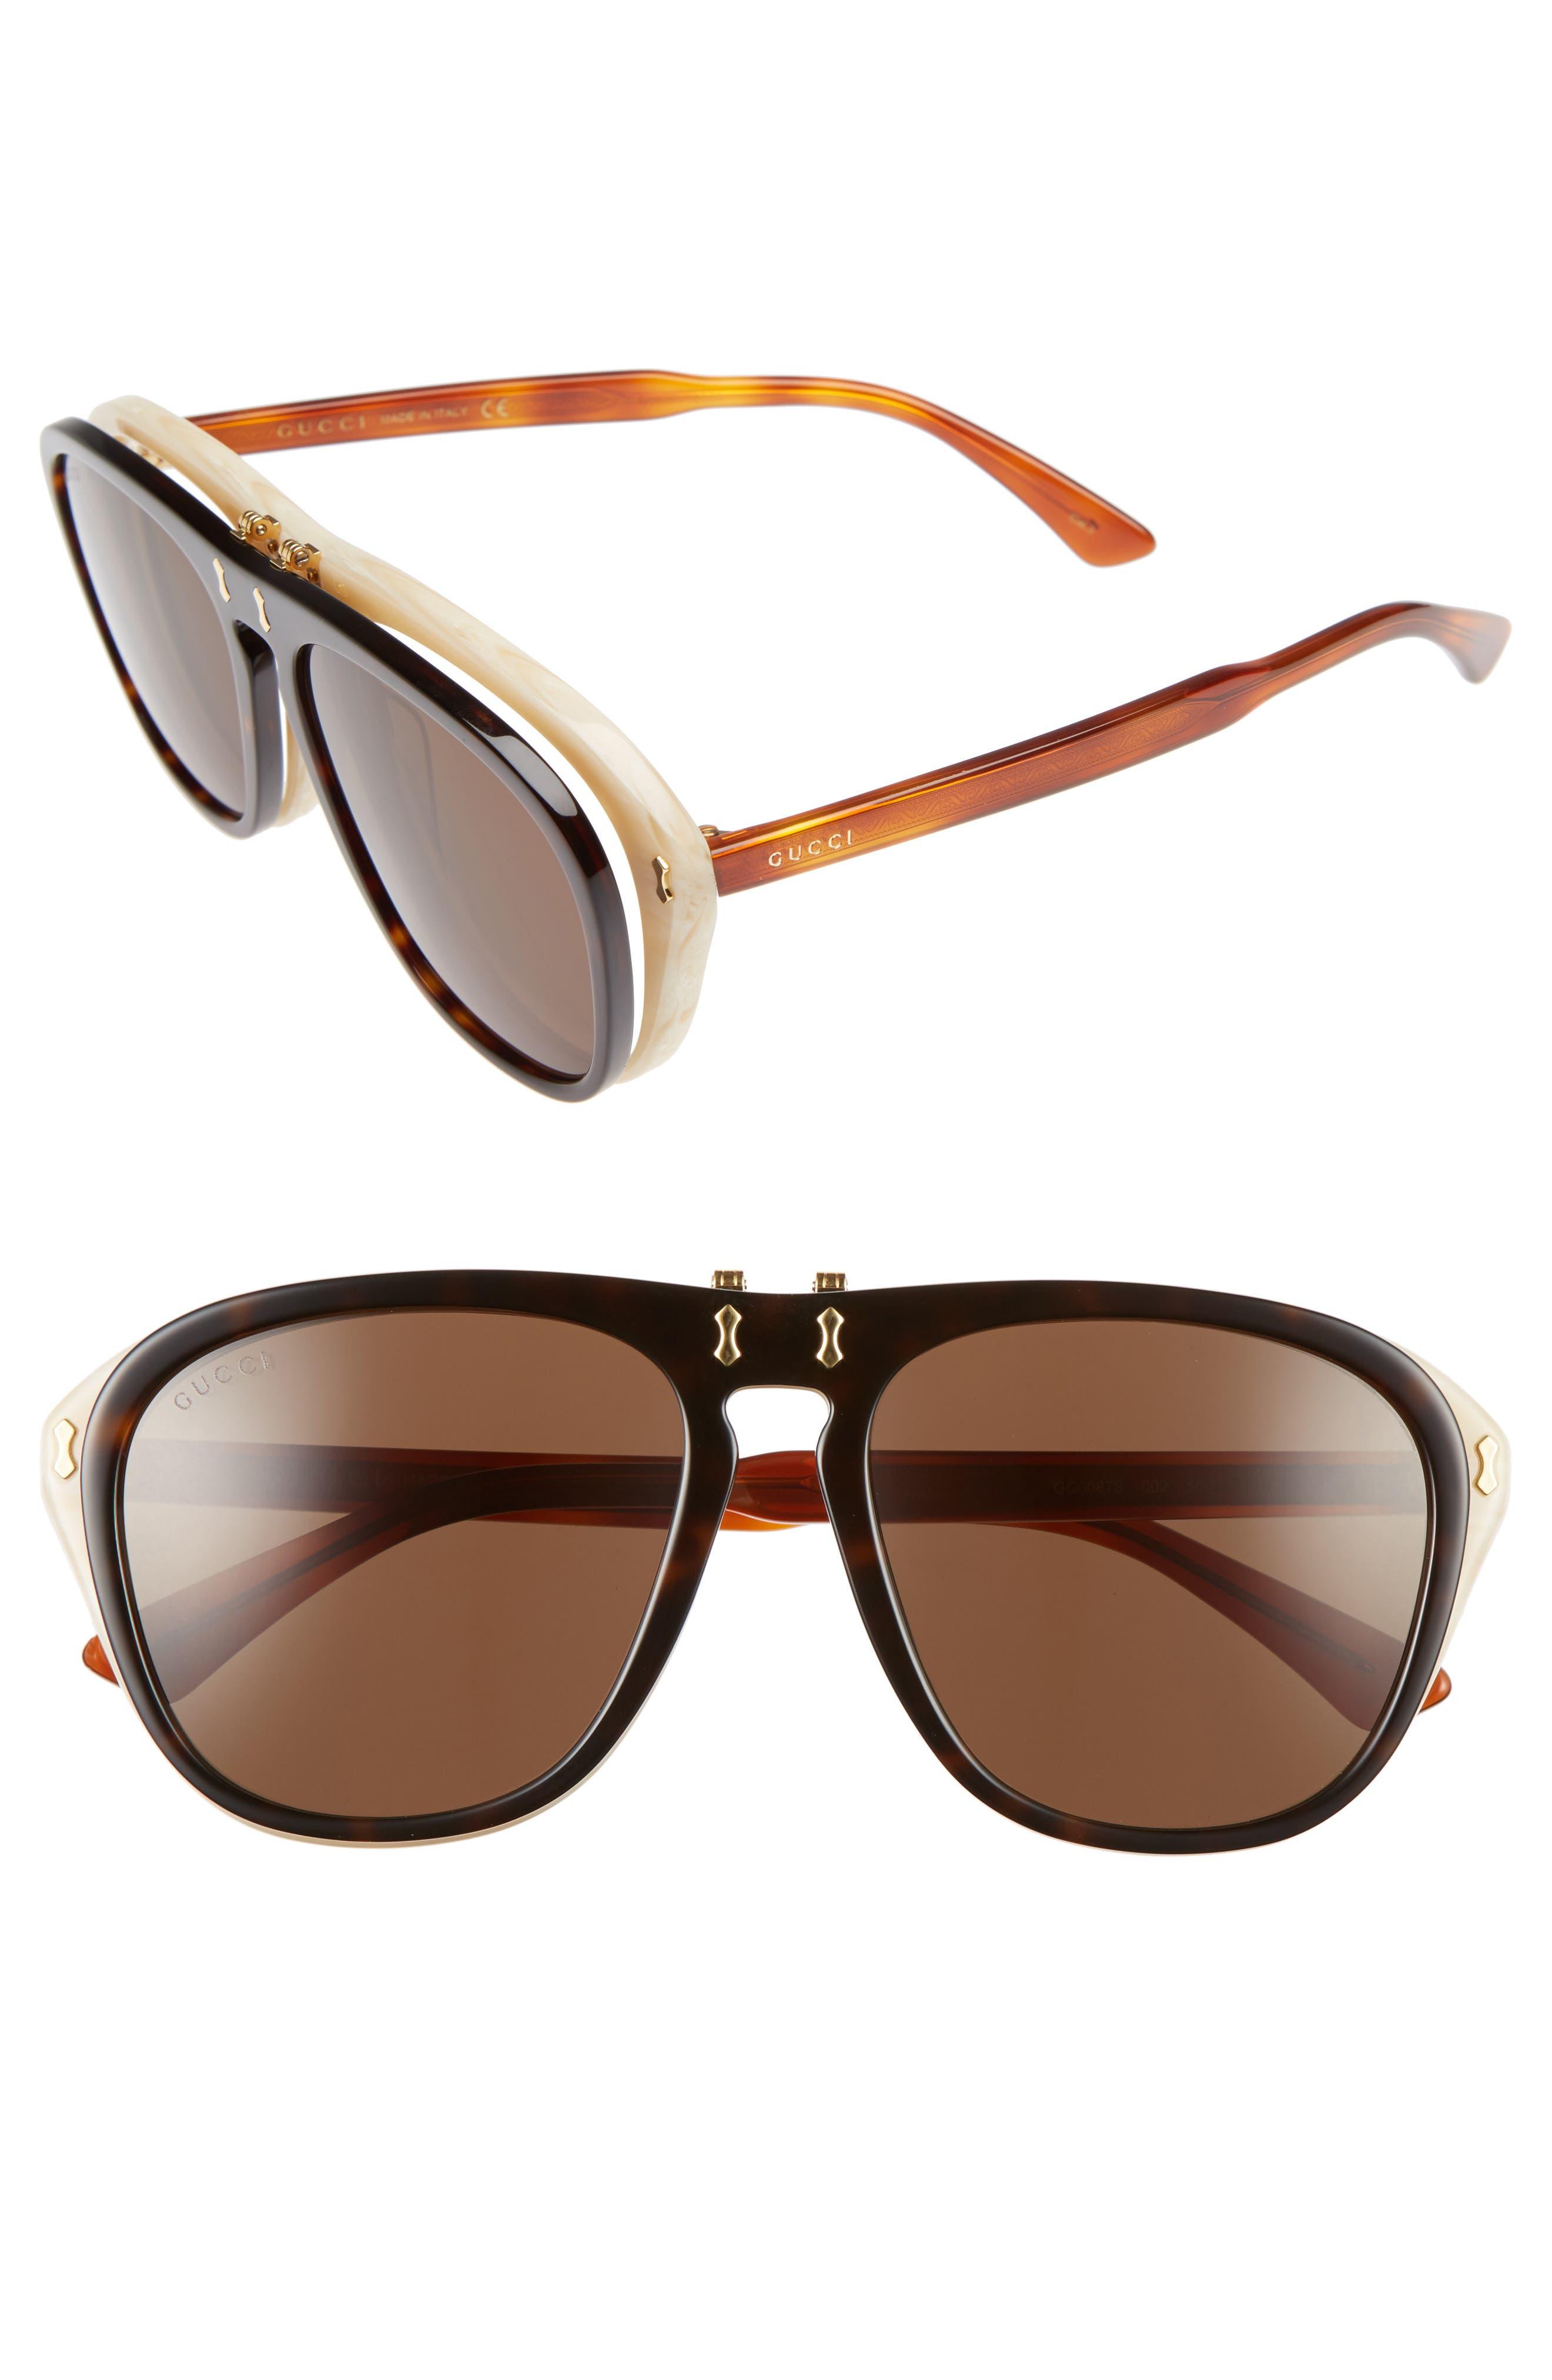 56mm Flip-Up Sunglasses,                         Main,                         color, HAVANA/ BROWN